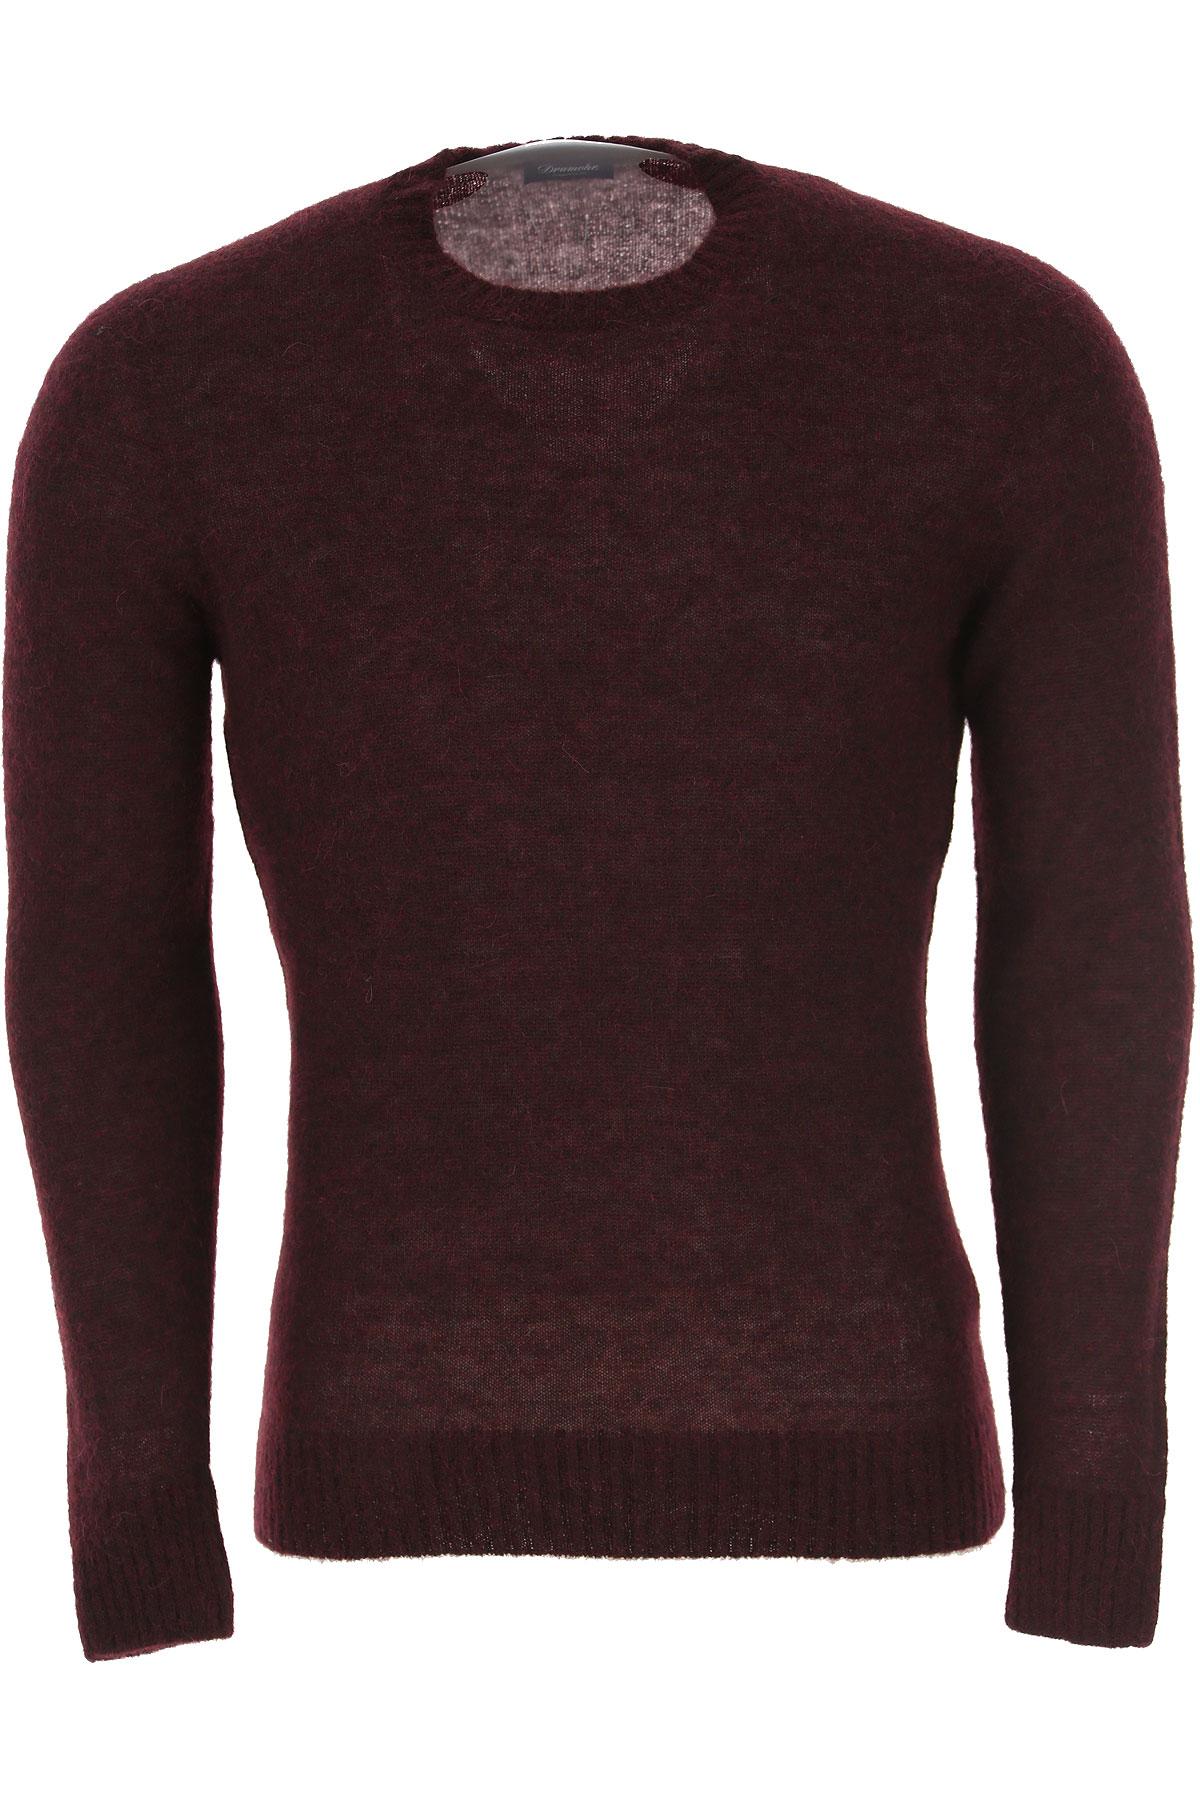 Drumohr Sweater for Men Jumper On Sale, Bordeaux, Wool, 2019, M XL XXL